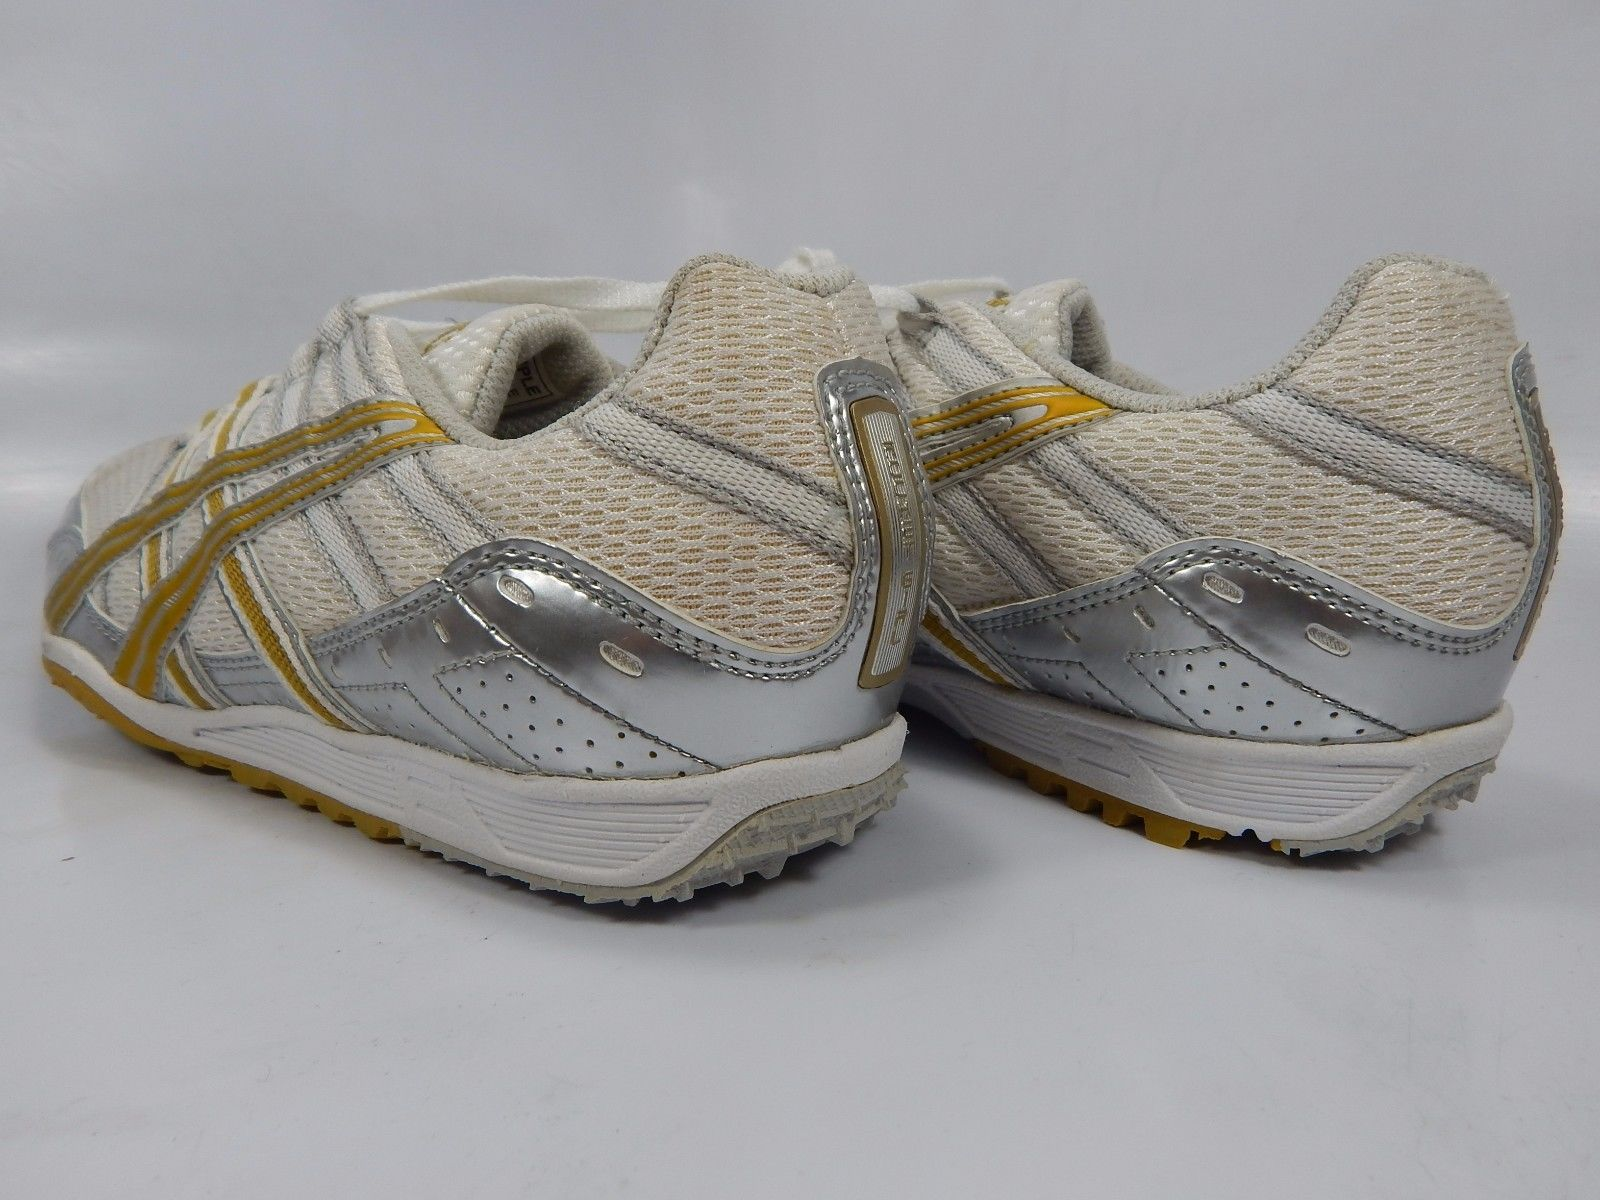 Asics Hyper Rocket Girls XC S Women's Cross- Country Shoes Sz US 7 M (B) EU 38